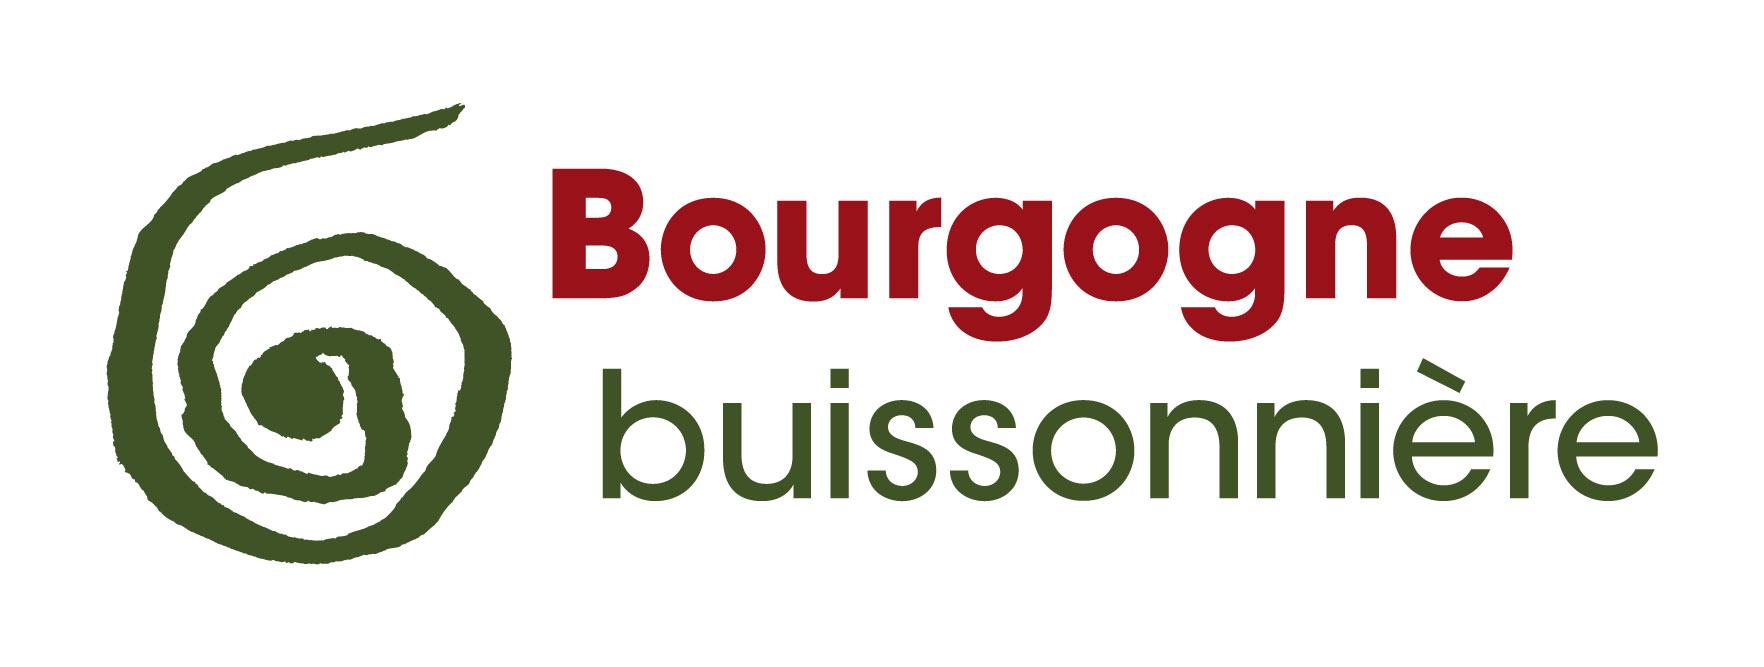 Groupes Bourgogne buissonnière